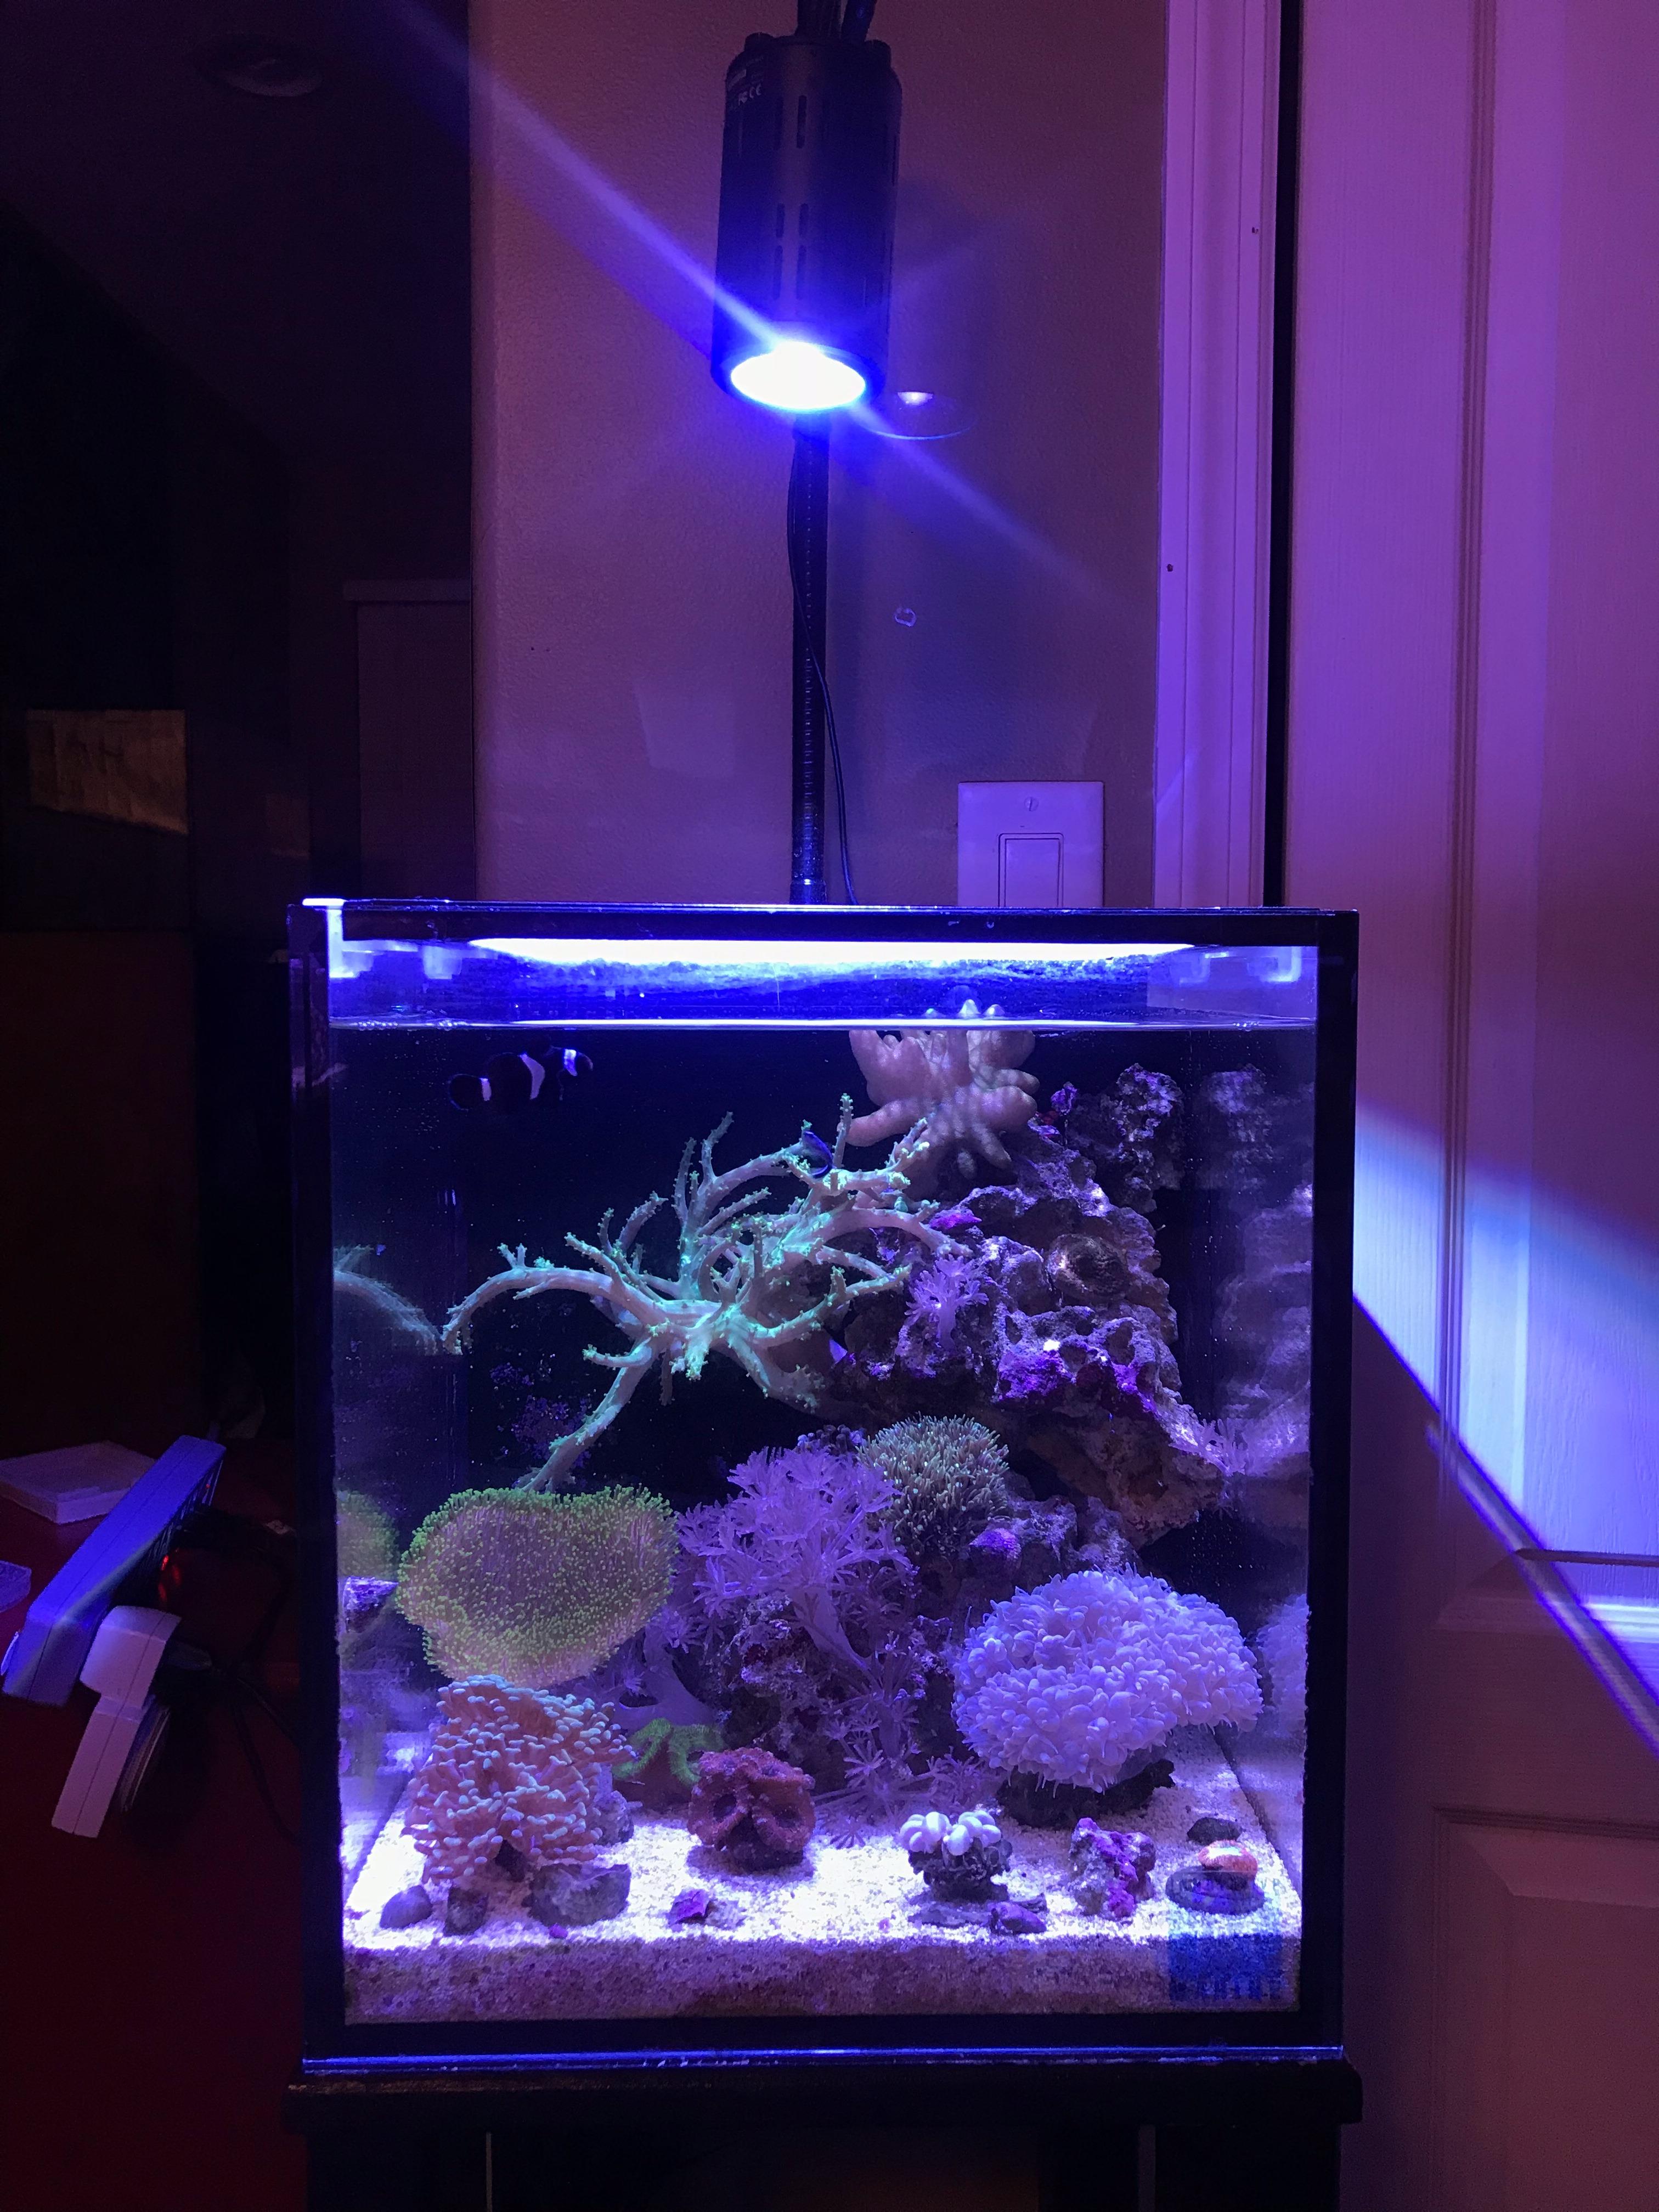 aquatic led small usd tank product aquarium mini lamp fish cylinder grass lights stand clamp light